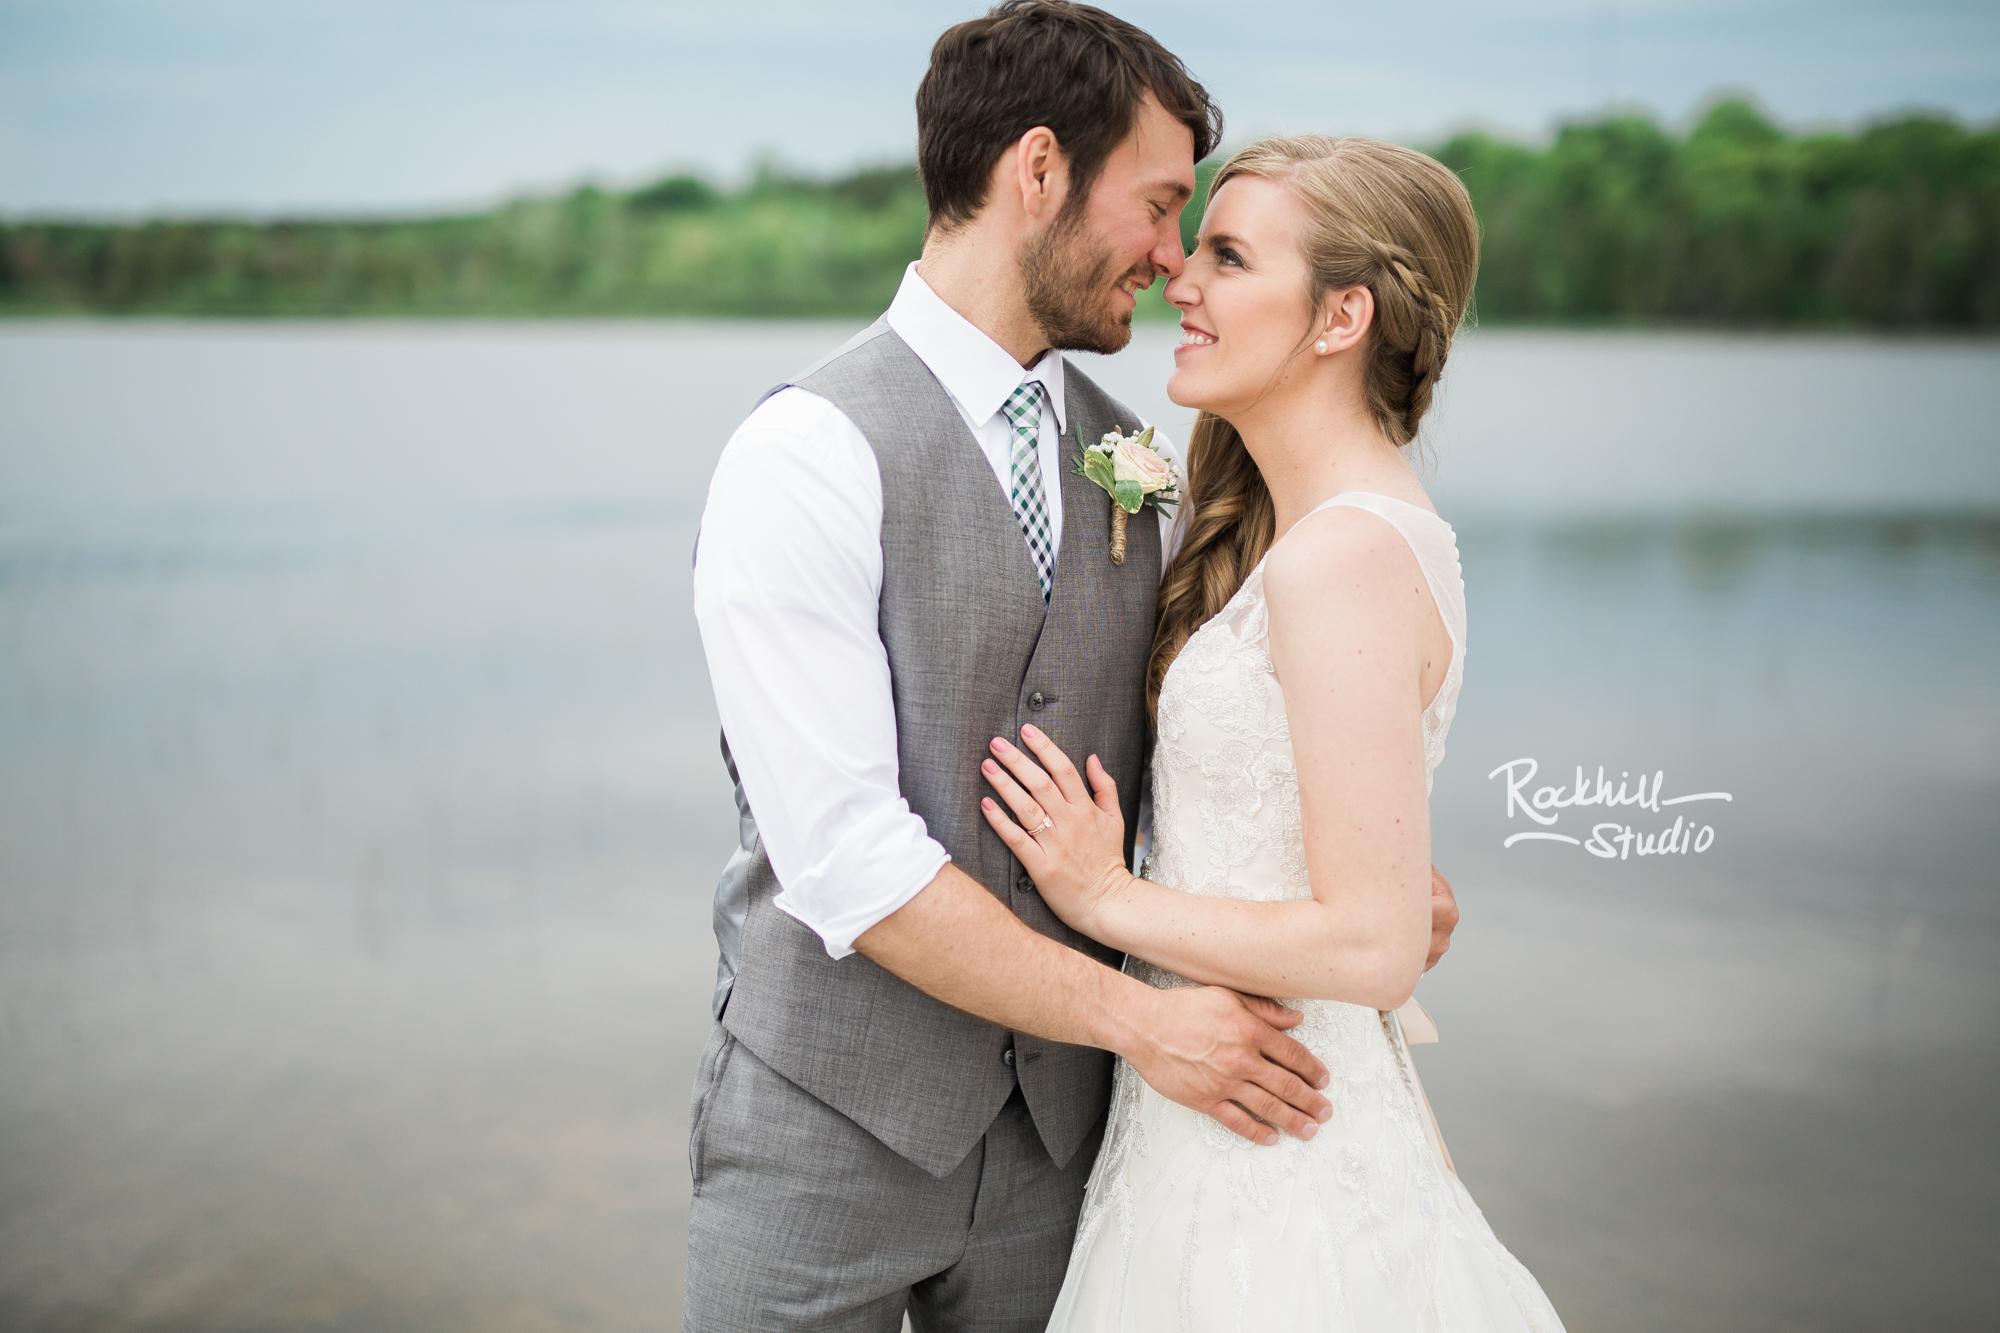 marquette-michigan-wedding-upper-peninsula-spring-photography-rockhill-ee-44.jpg